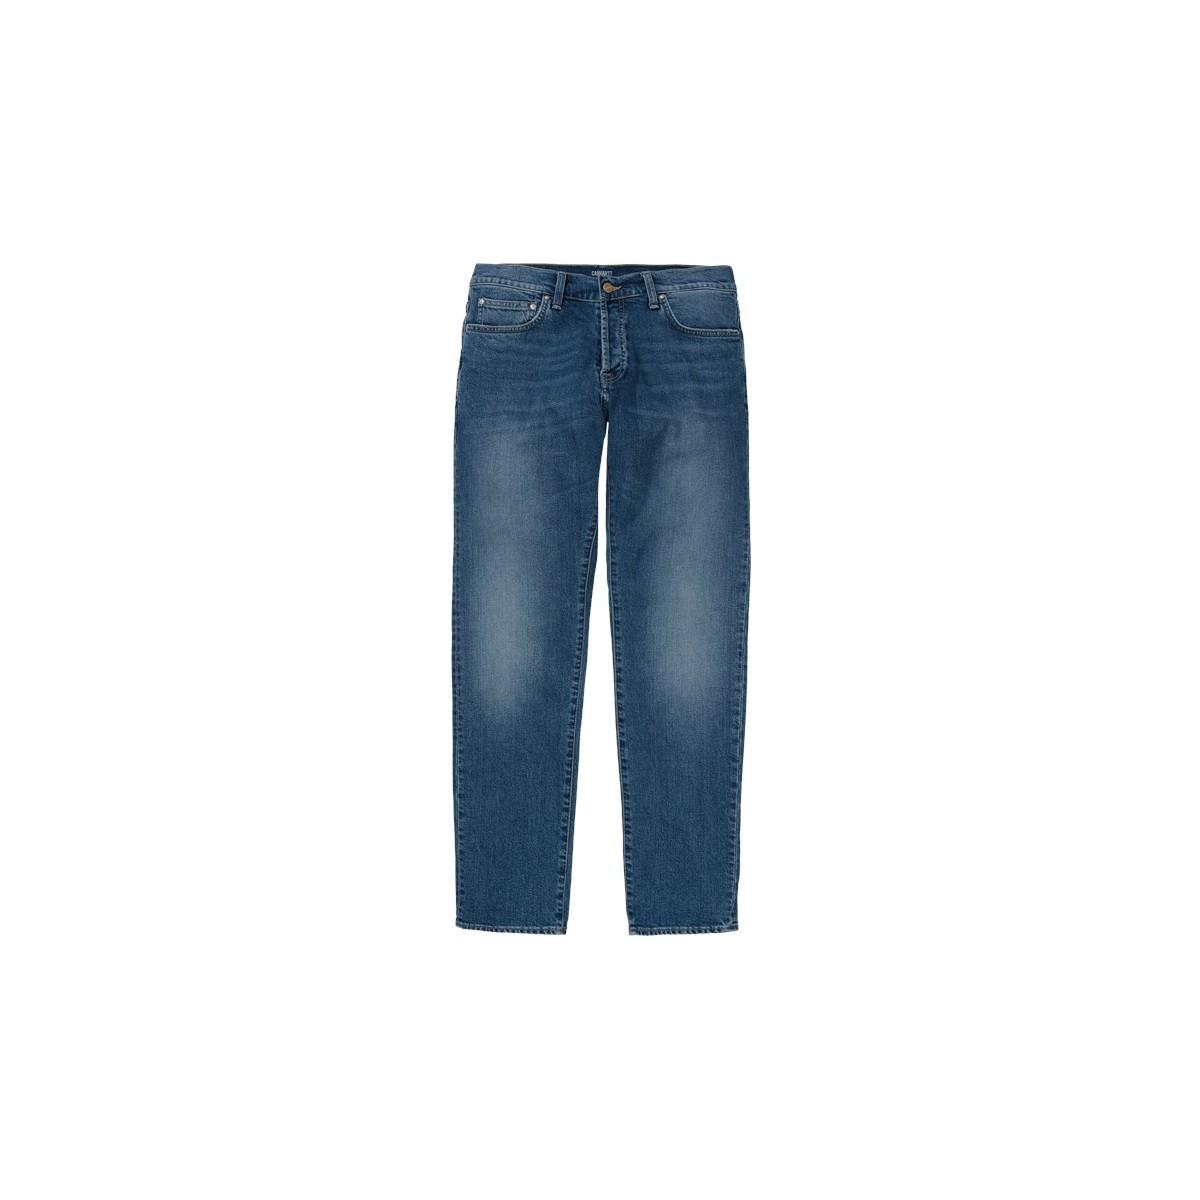 Carhartt WIP - Jeans Klondike blue stone coast